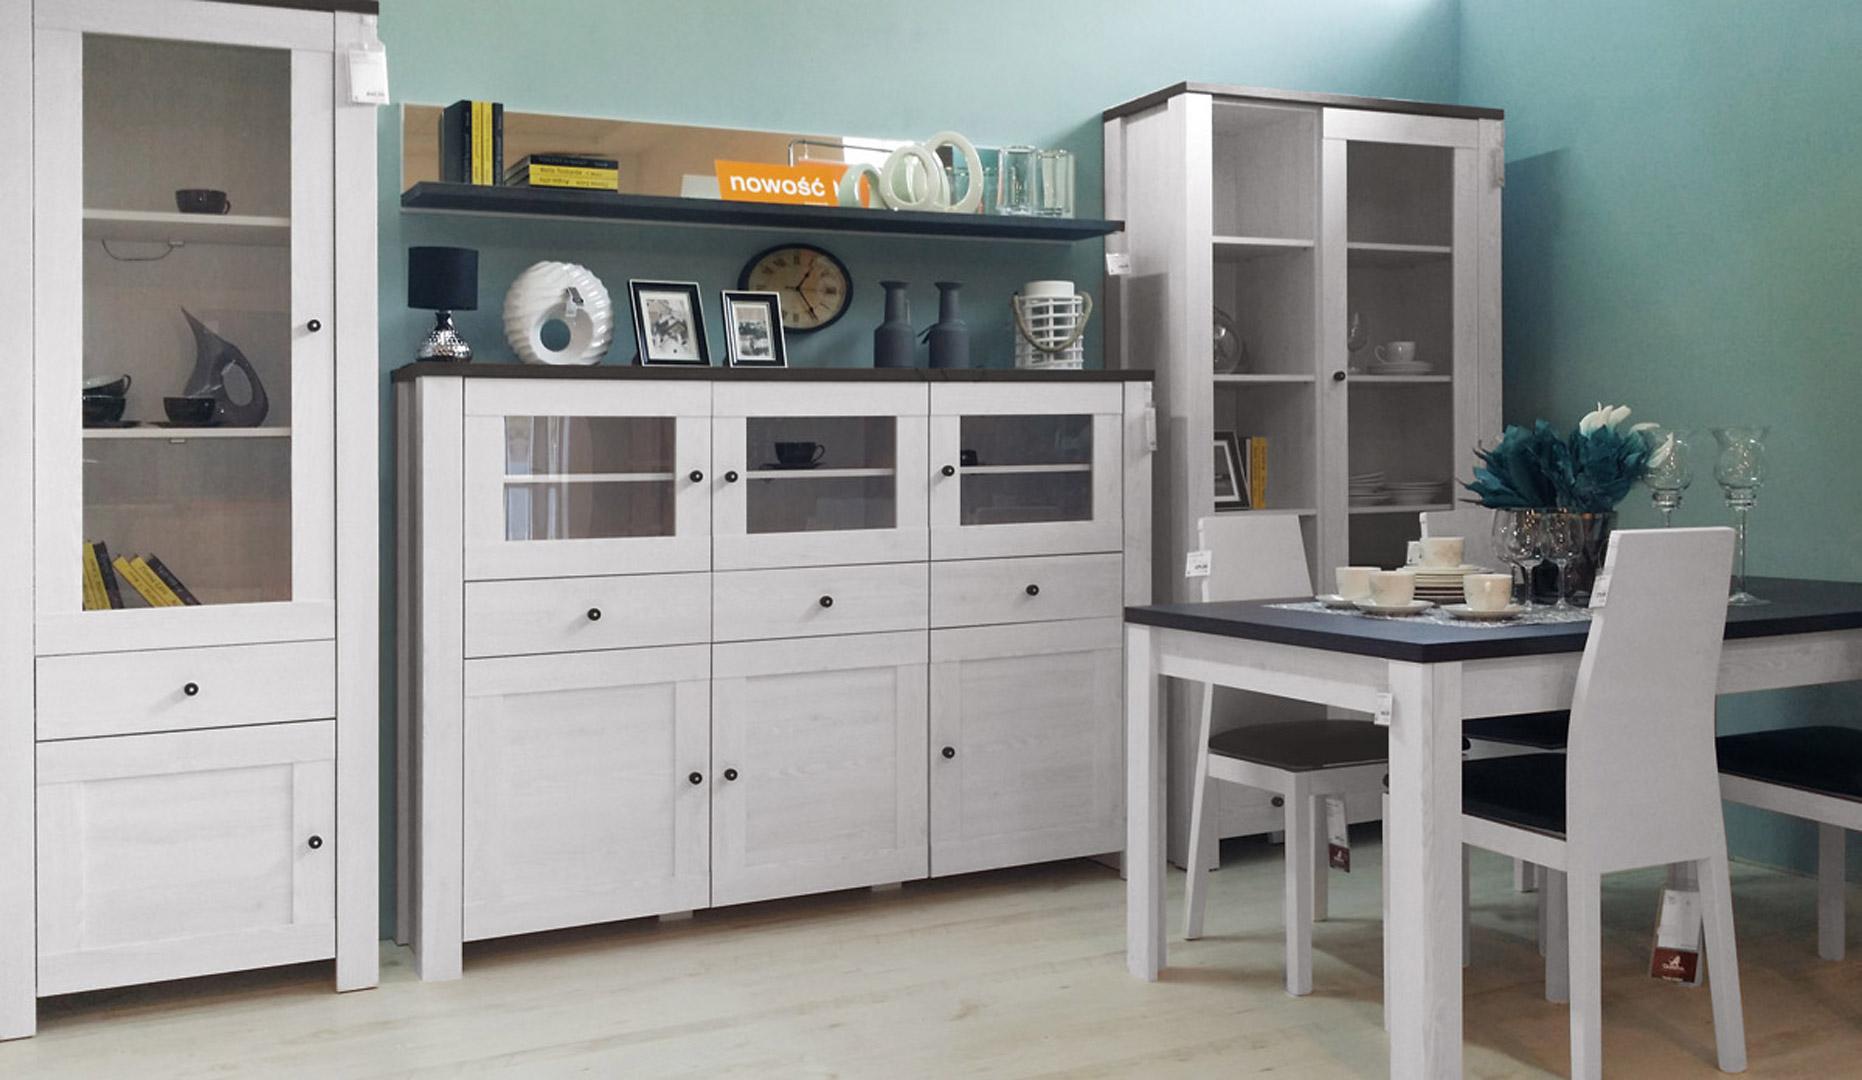 Black And White Salon  Joy Studio Design Gallery  Best   -> Kuchnia Vigo Cena